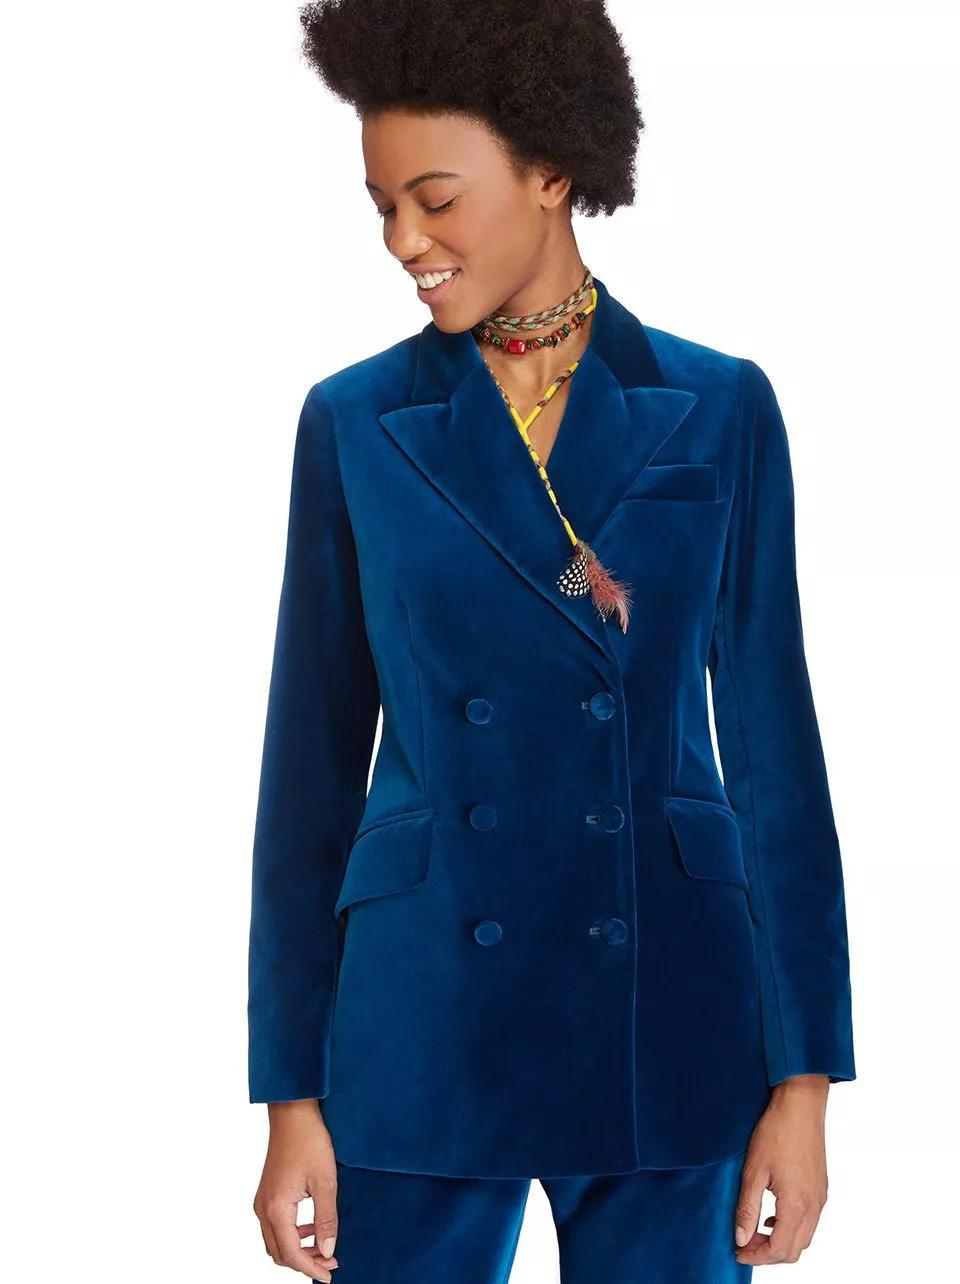 Etro宝蓝丝绒西装外套